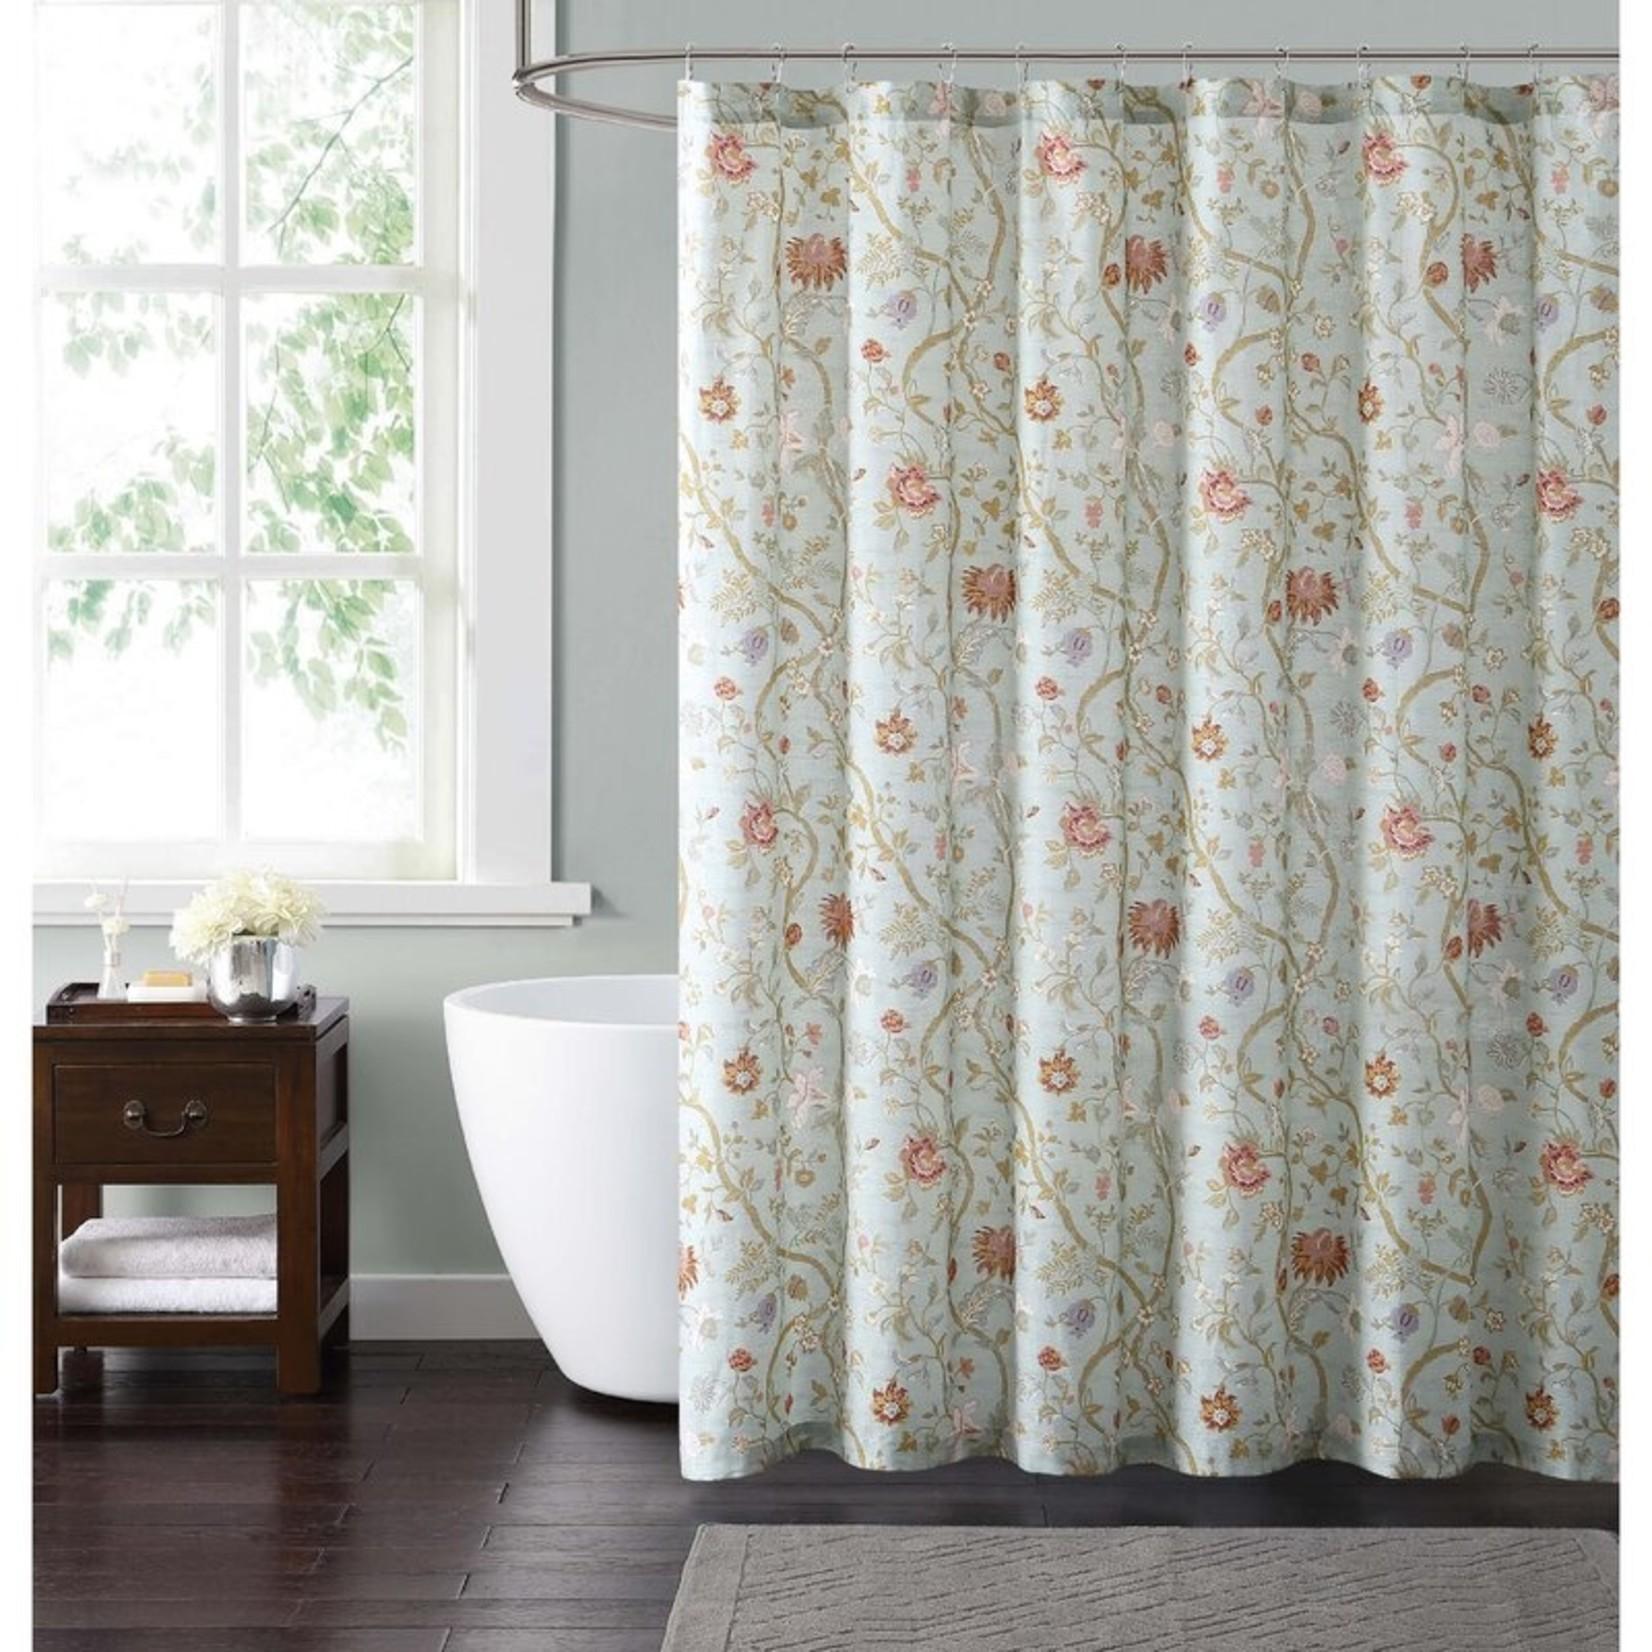 *Upton Cottage Sirgle Shower Curtain - Blue